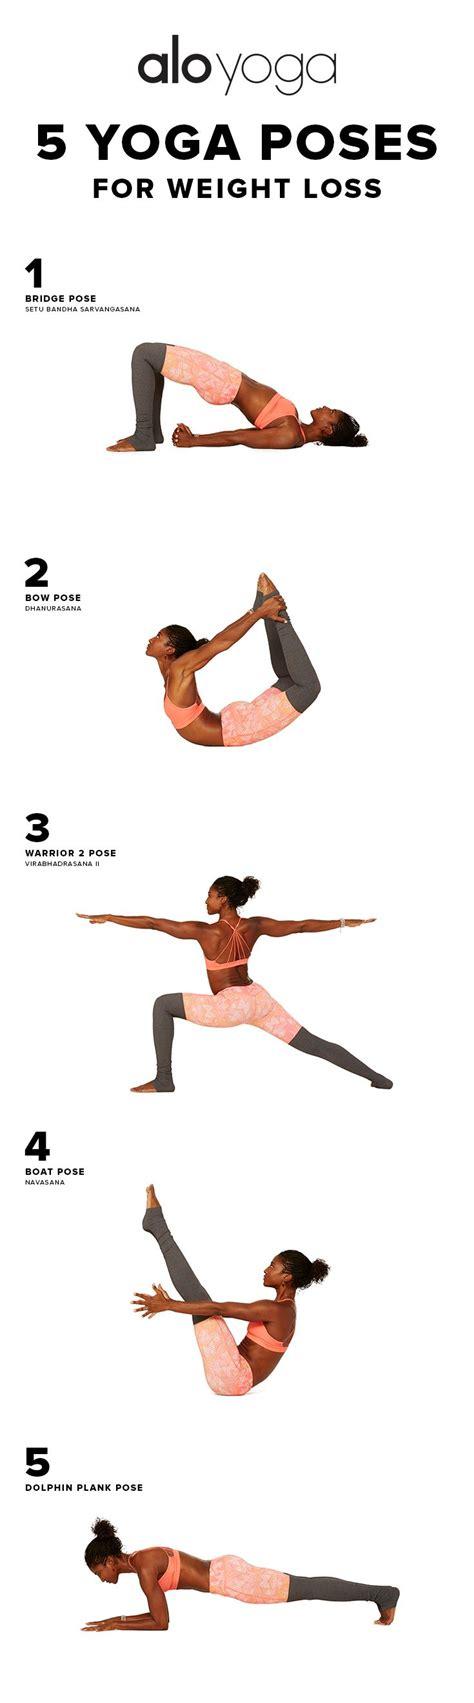 boat pose kundalini yoga 5 yoga poses for weightloss exercise yoga exercice